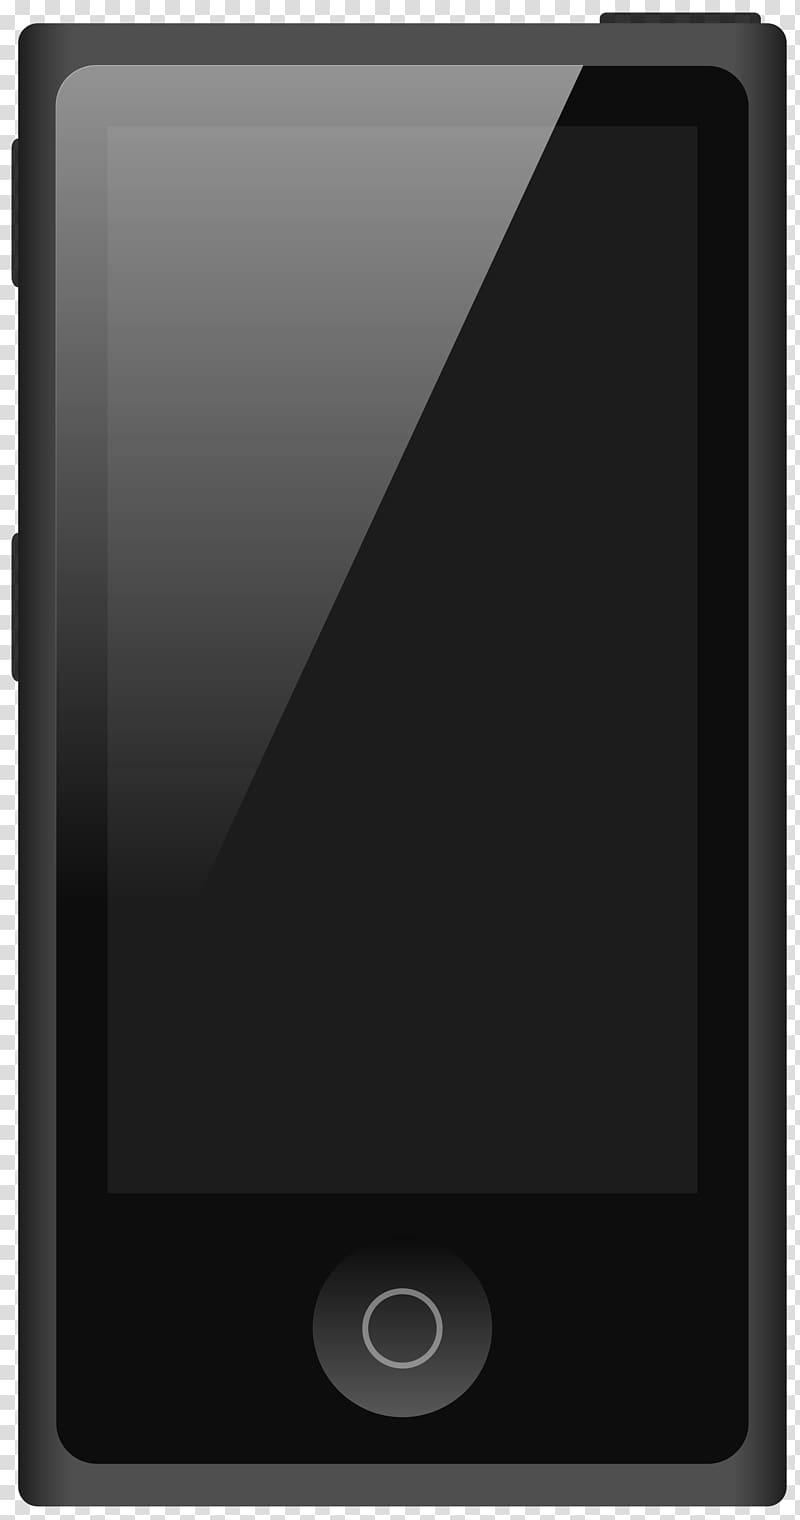 IPod touch iPod nano iPod Shuffle iPod mini Apple Ipod 800x1520